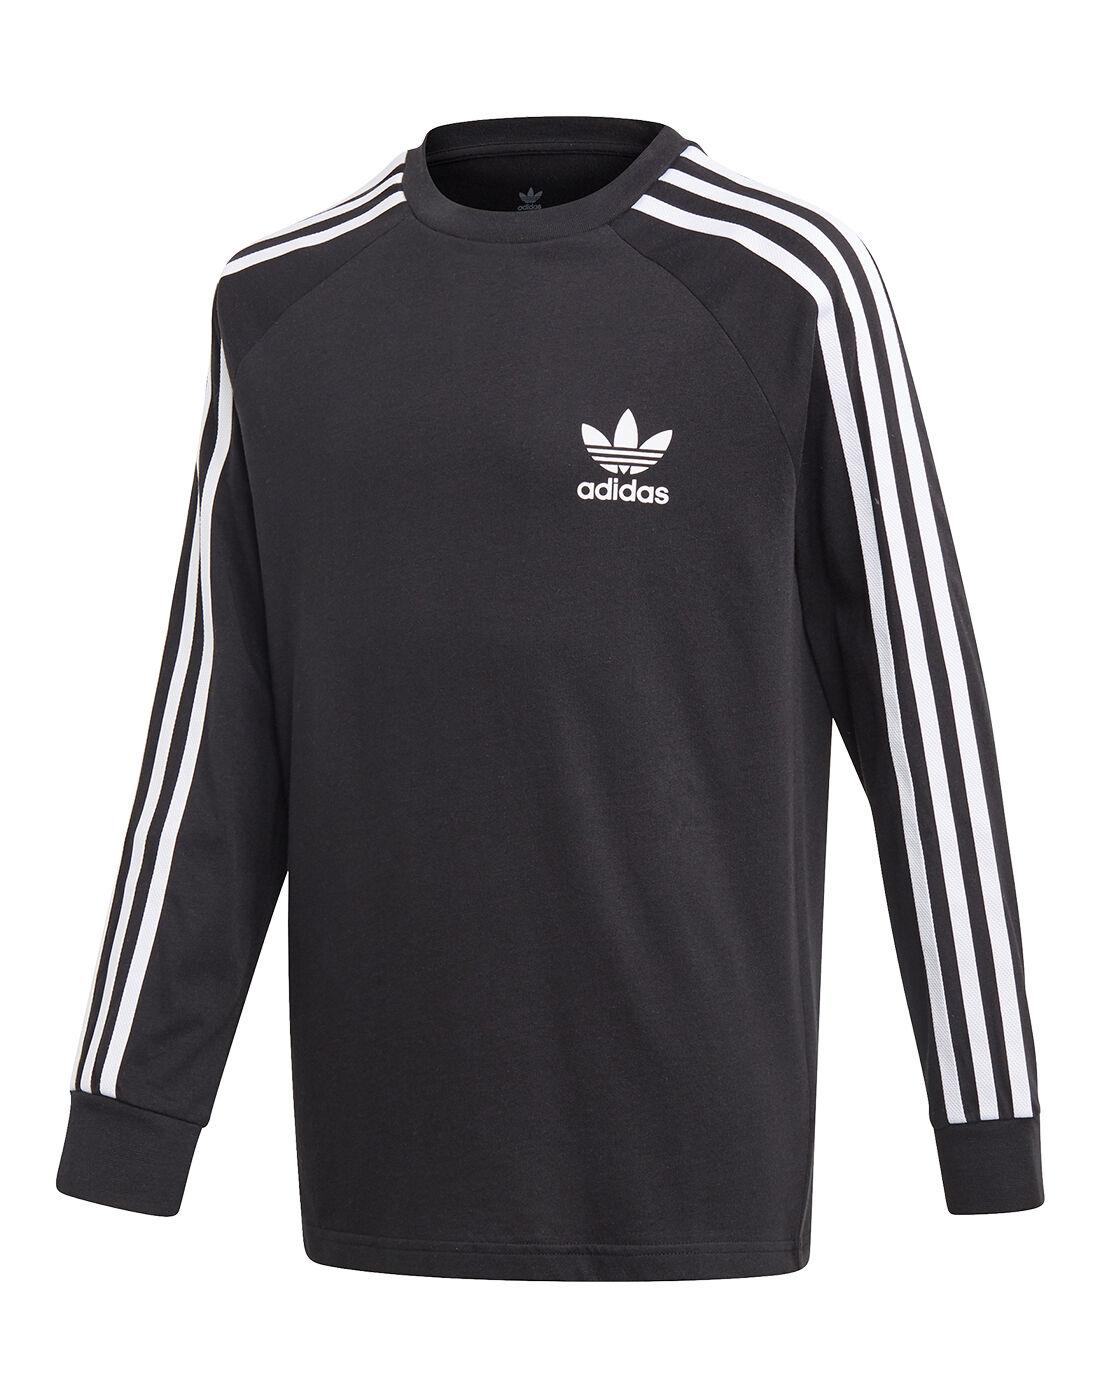 adidas Originals Older Kids 3-Stripes T-shirt - Black | finish ...